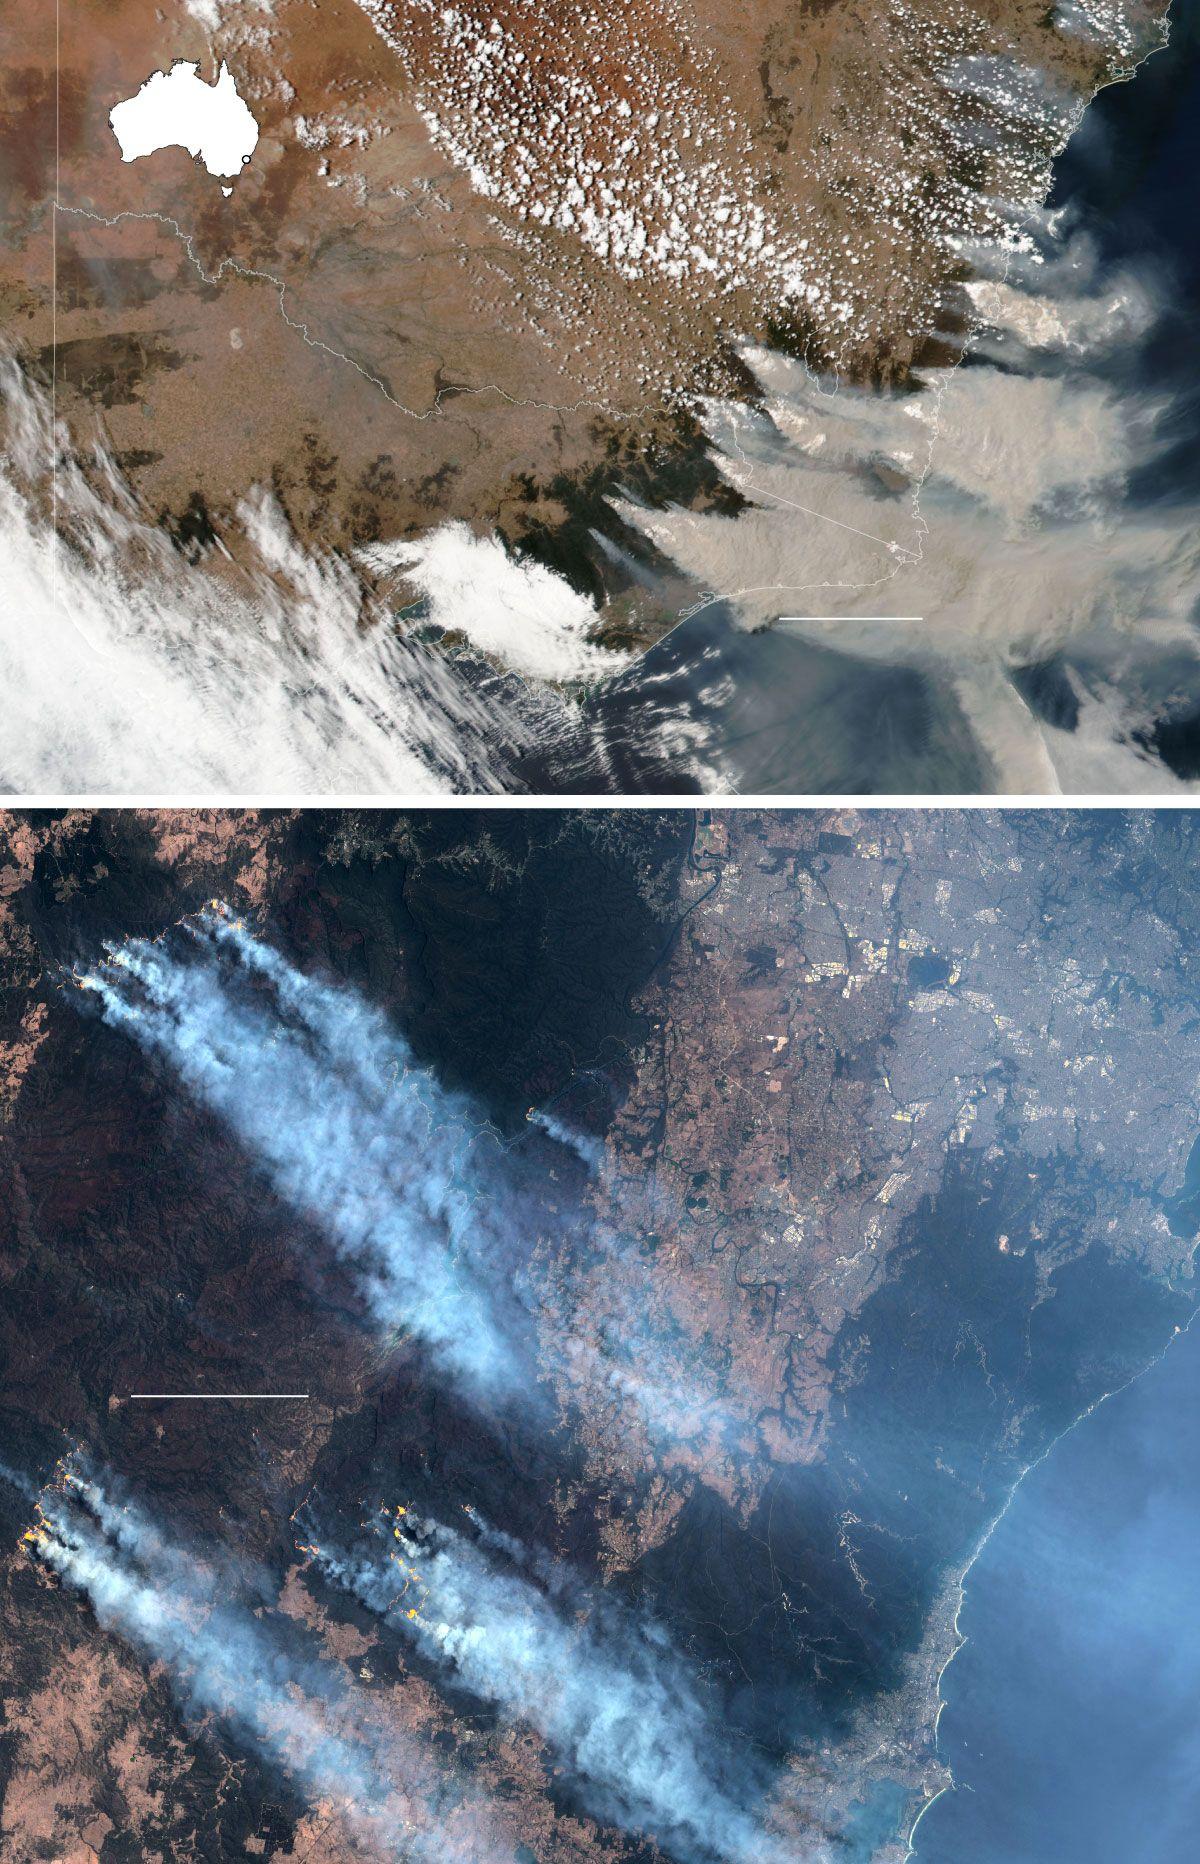 Here's Where Australia's Destructive Wildfires Are Burning